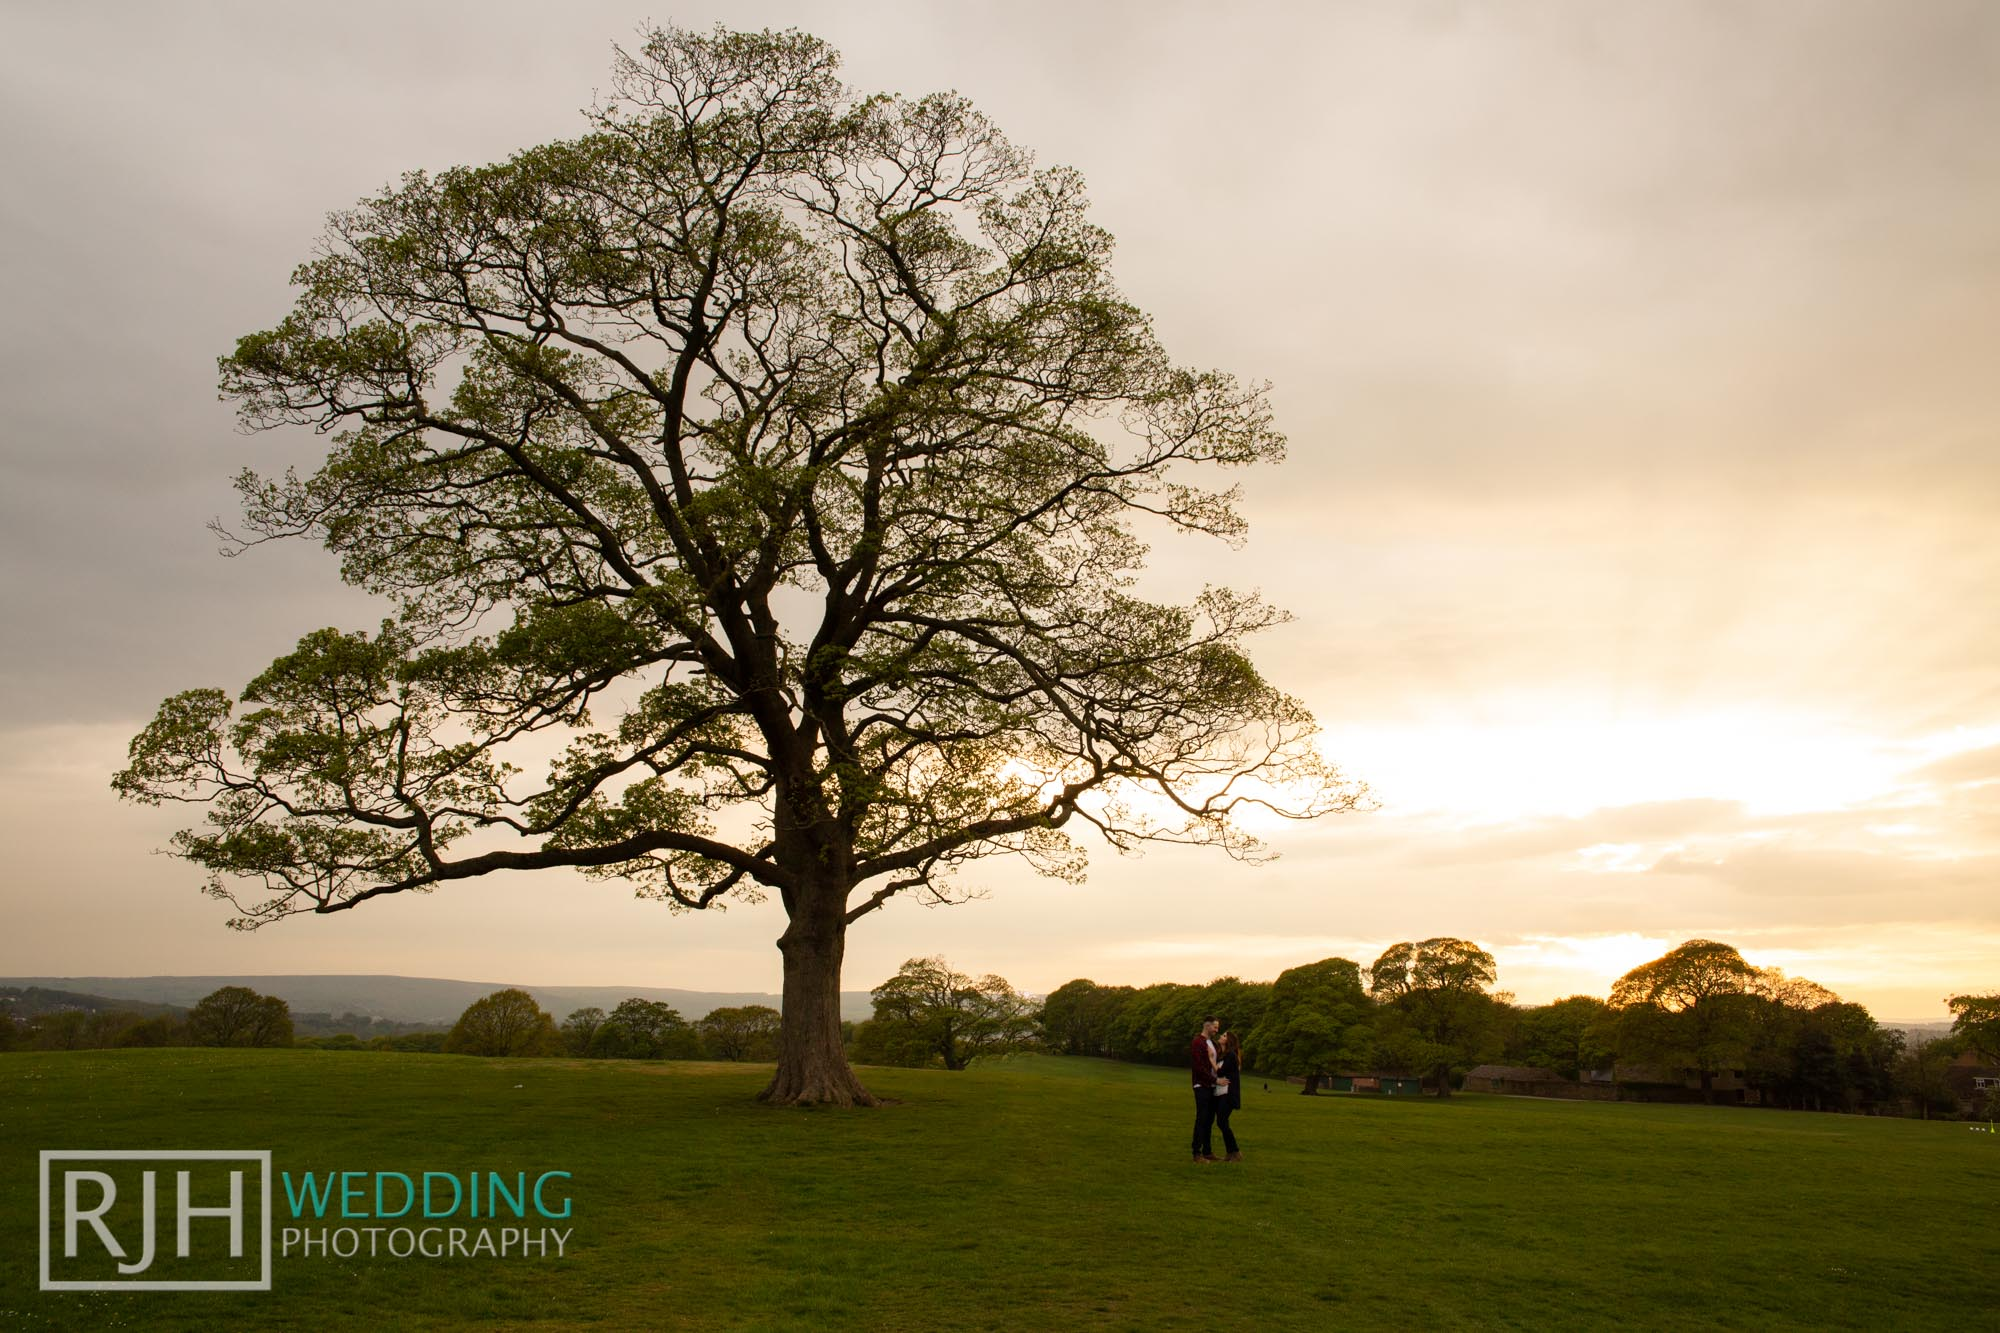 Pre-wedding photography_Abbie & Reece_Graves Park_027_3C2A9378.jpg